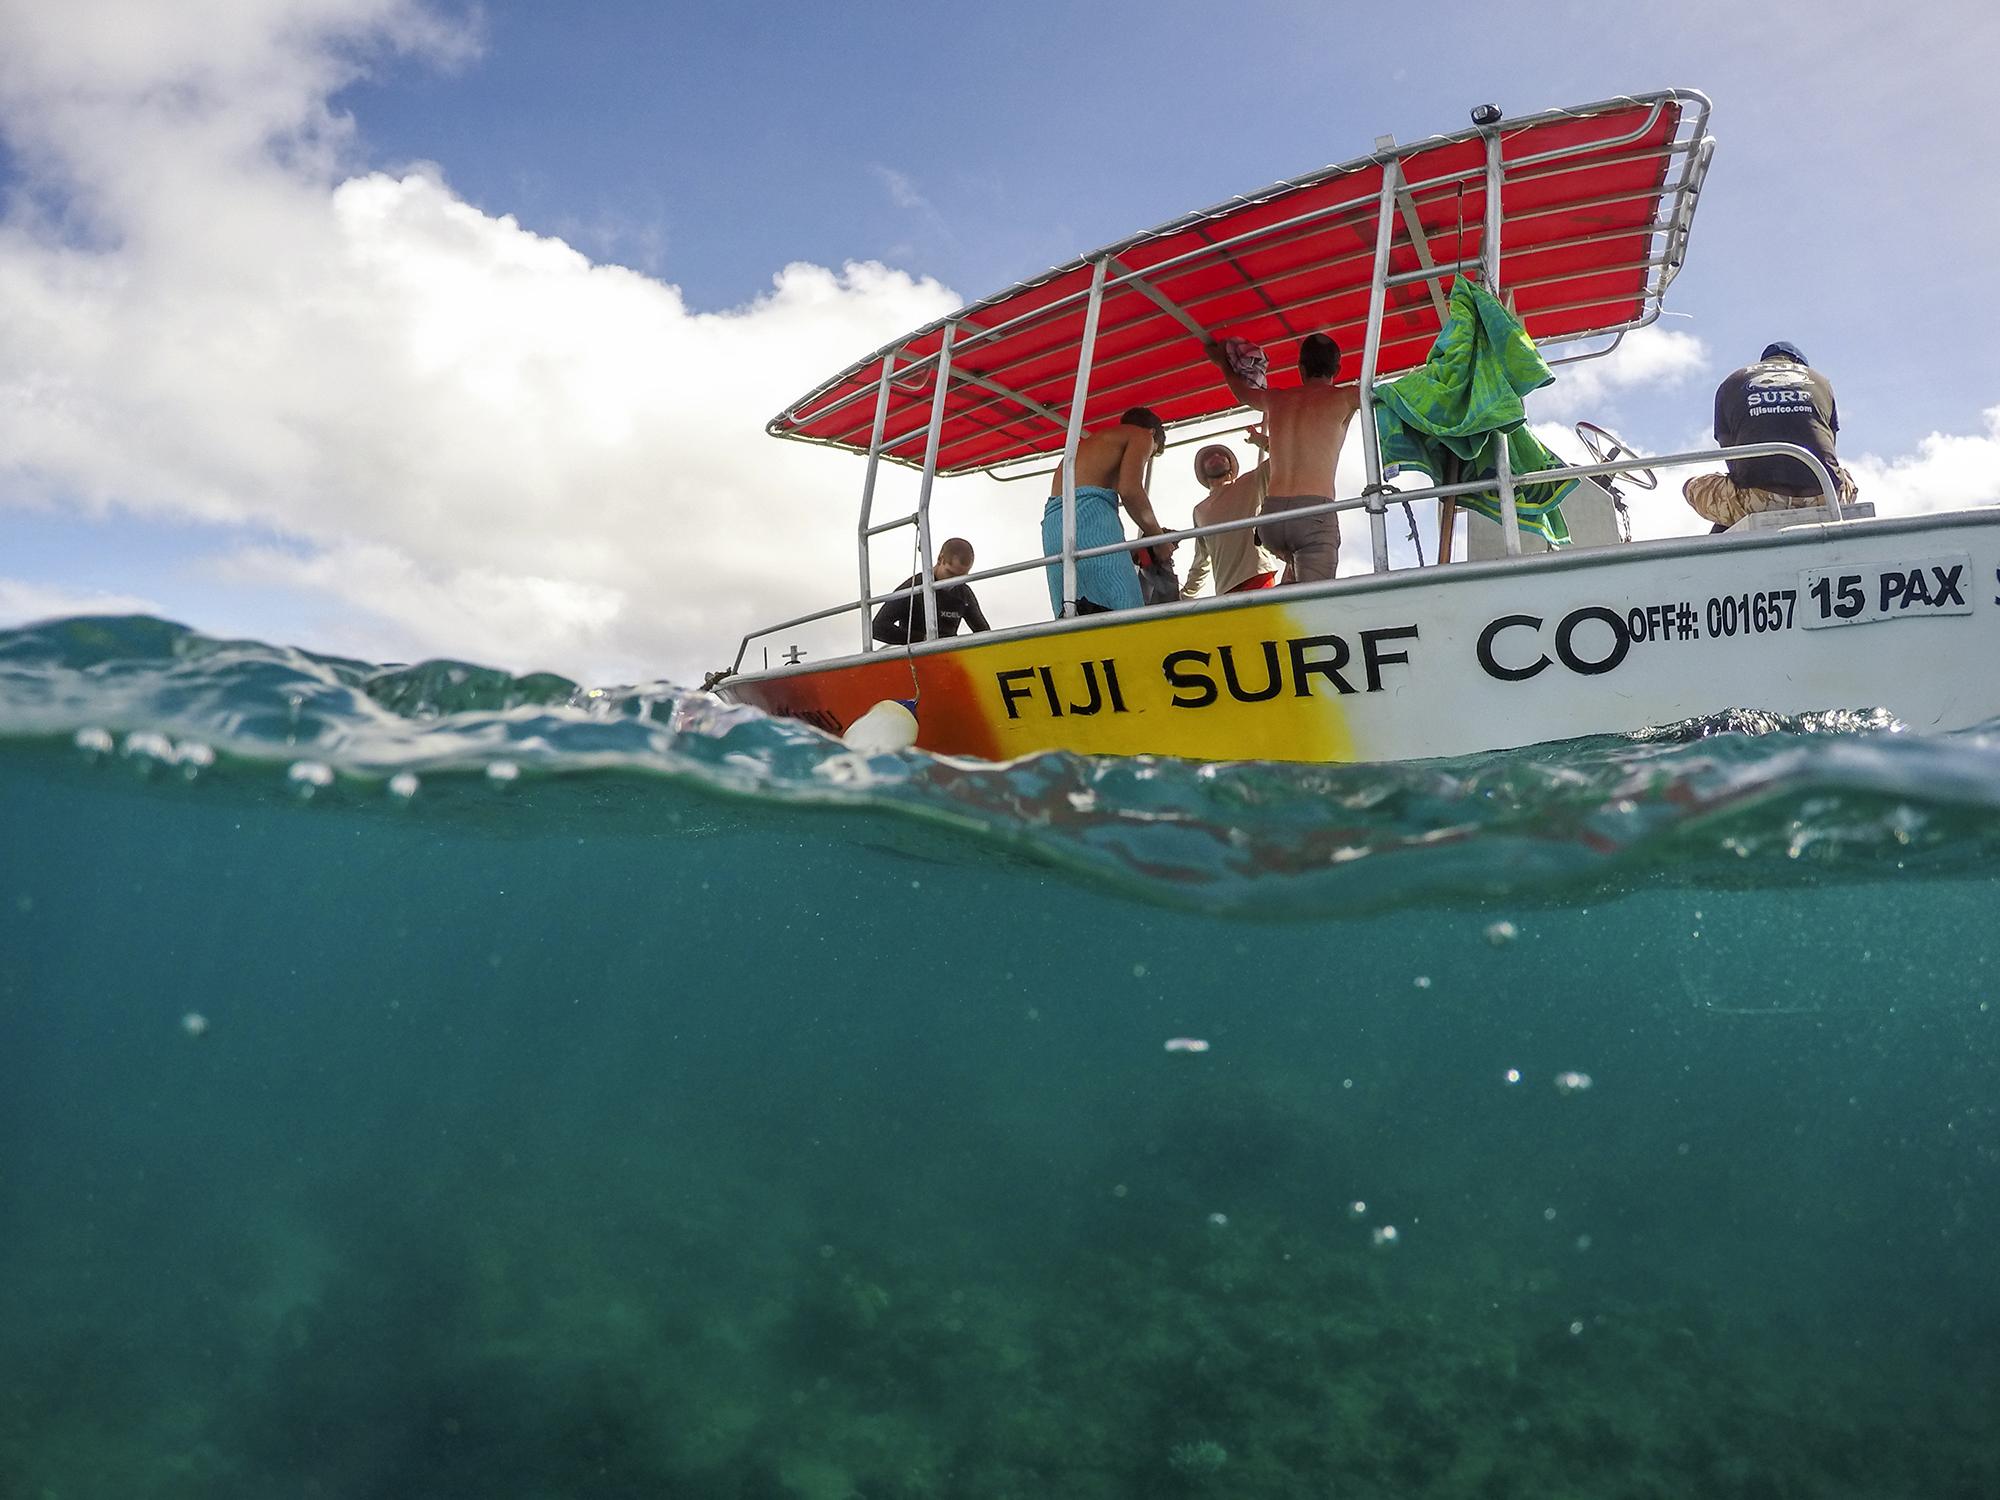 Fiji Surf Gopro Dome